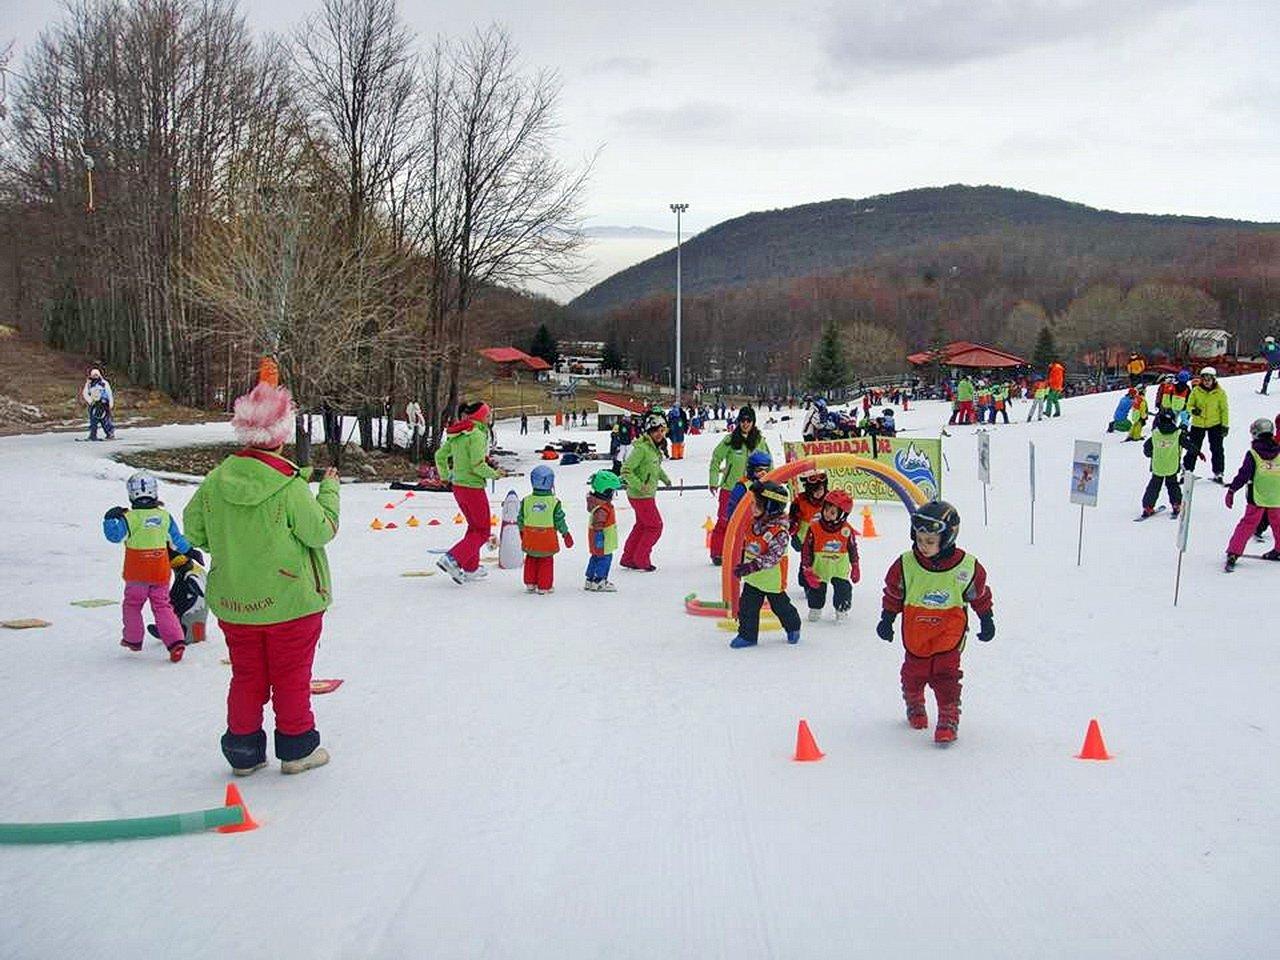 skiteam.gr-ski-academy-thessaloniki-2nd-weekend-18-19-january-2015-3-5-pigadiai-03